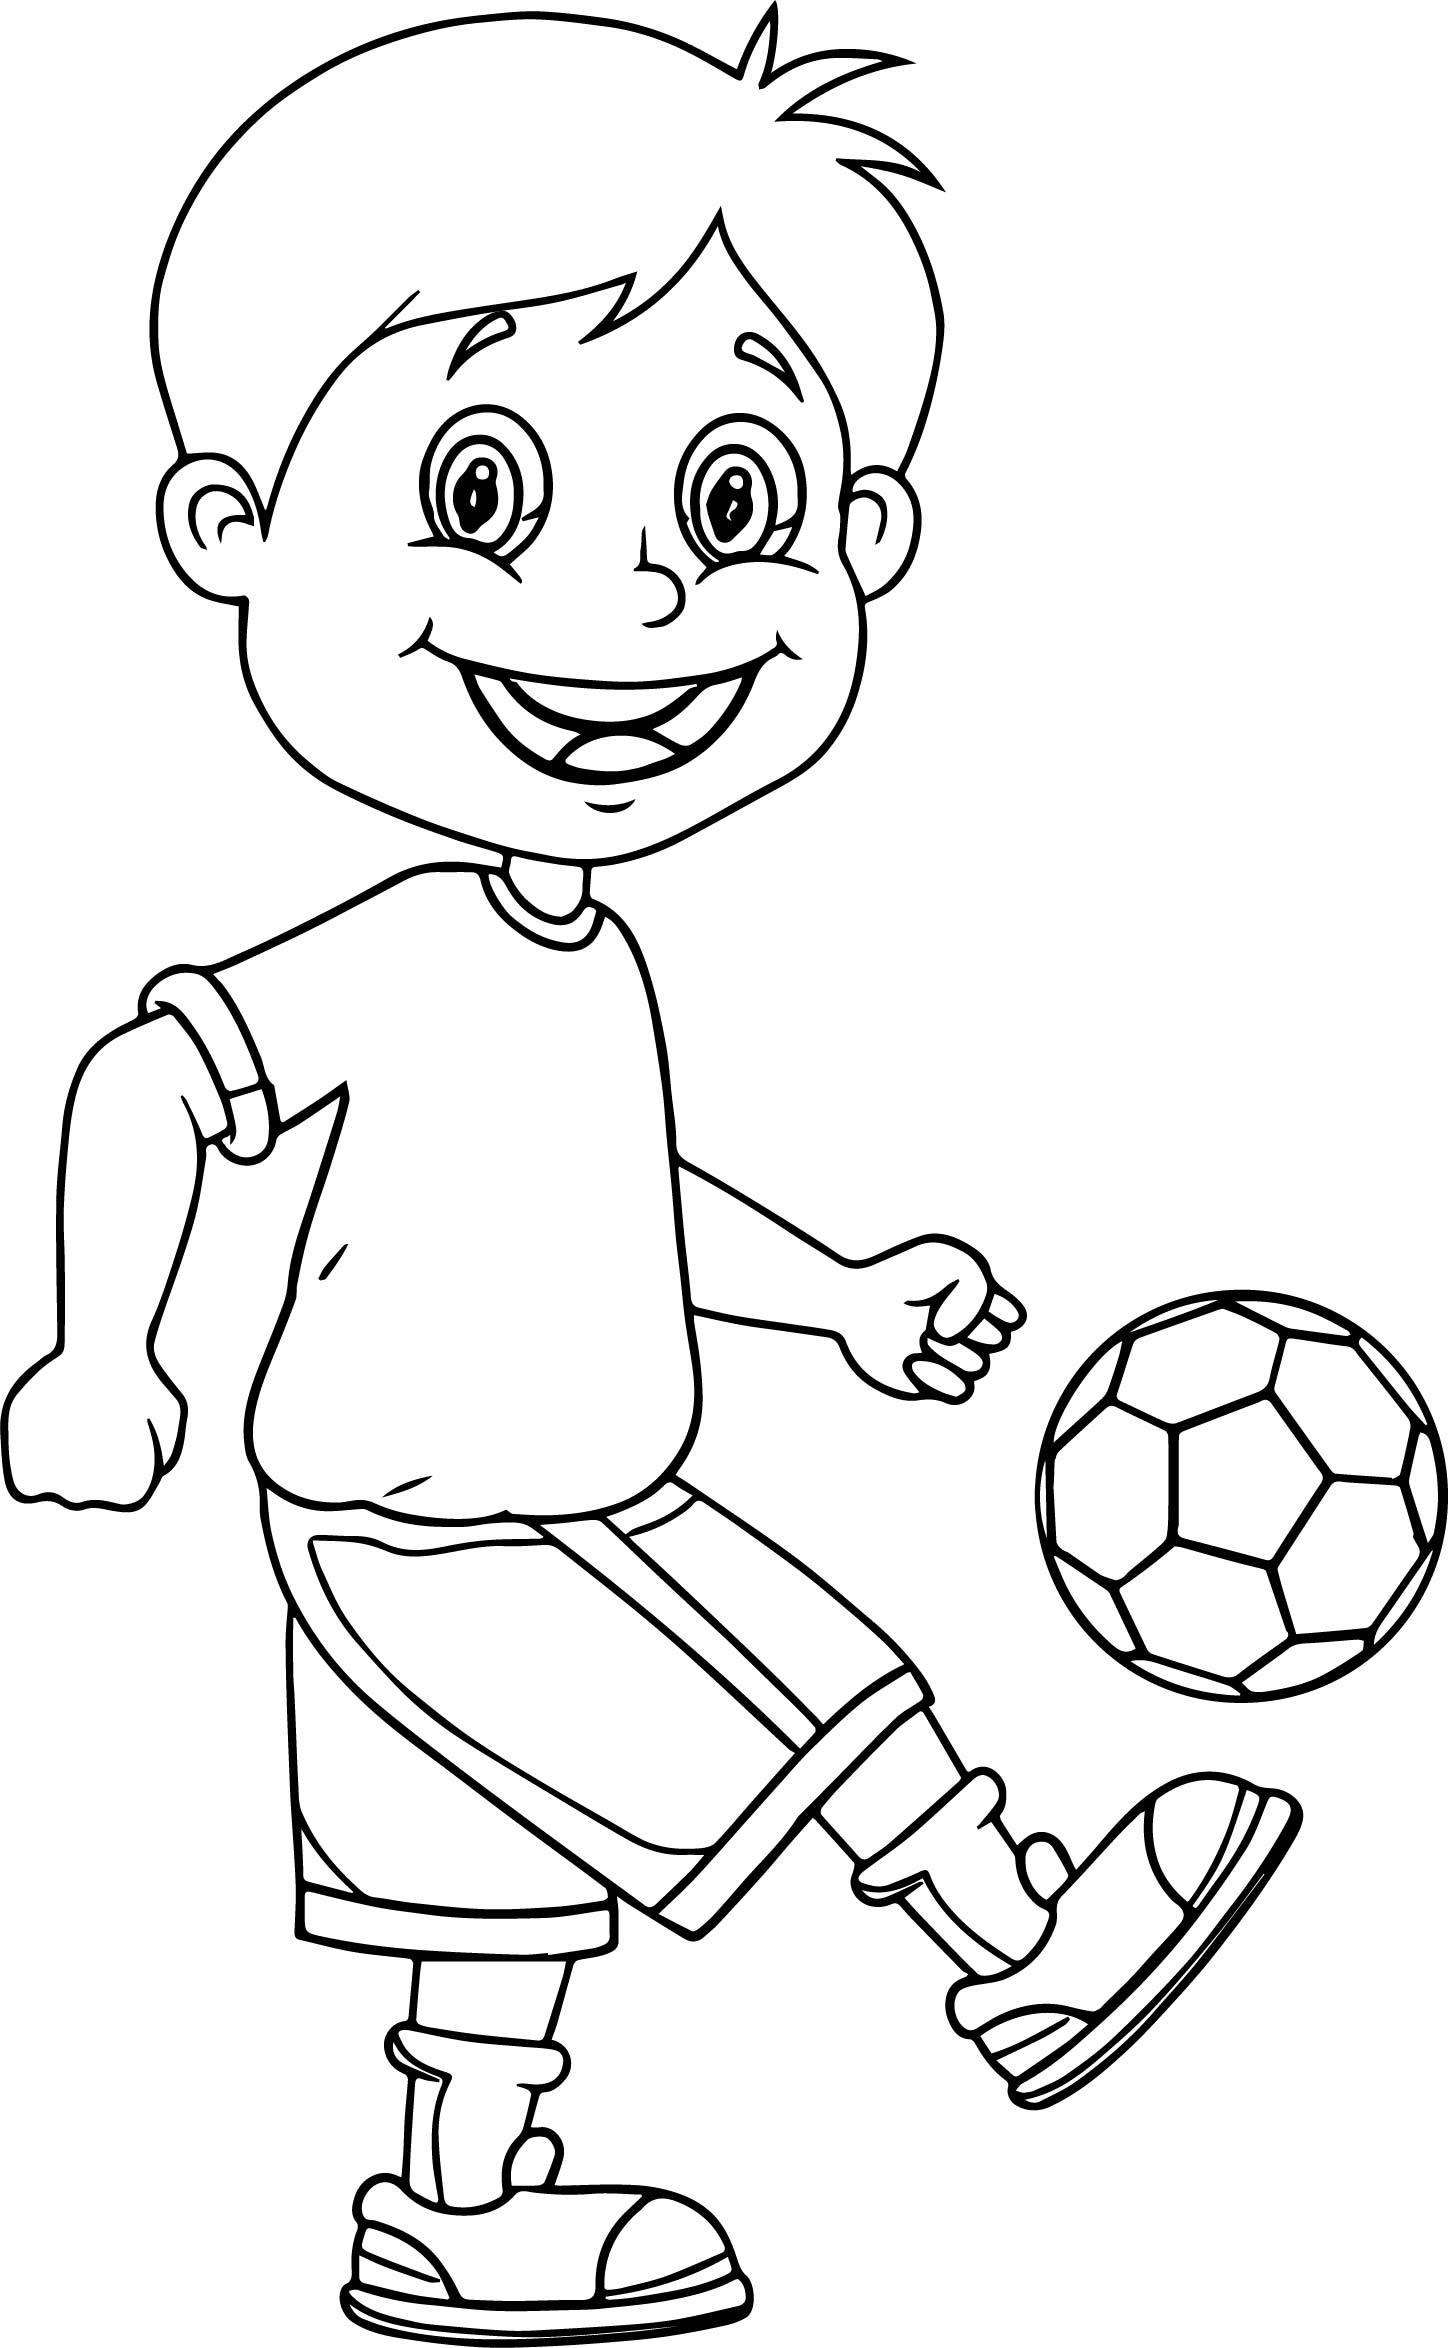 1448x2348 Boy Playing Football Drawing Bounce Ball Kids Soccer Playing